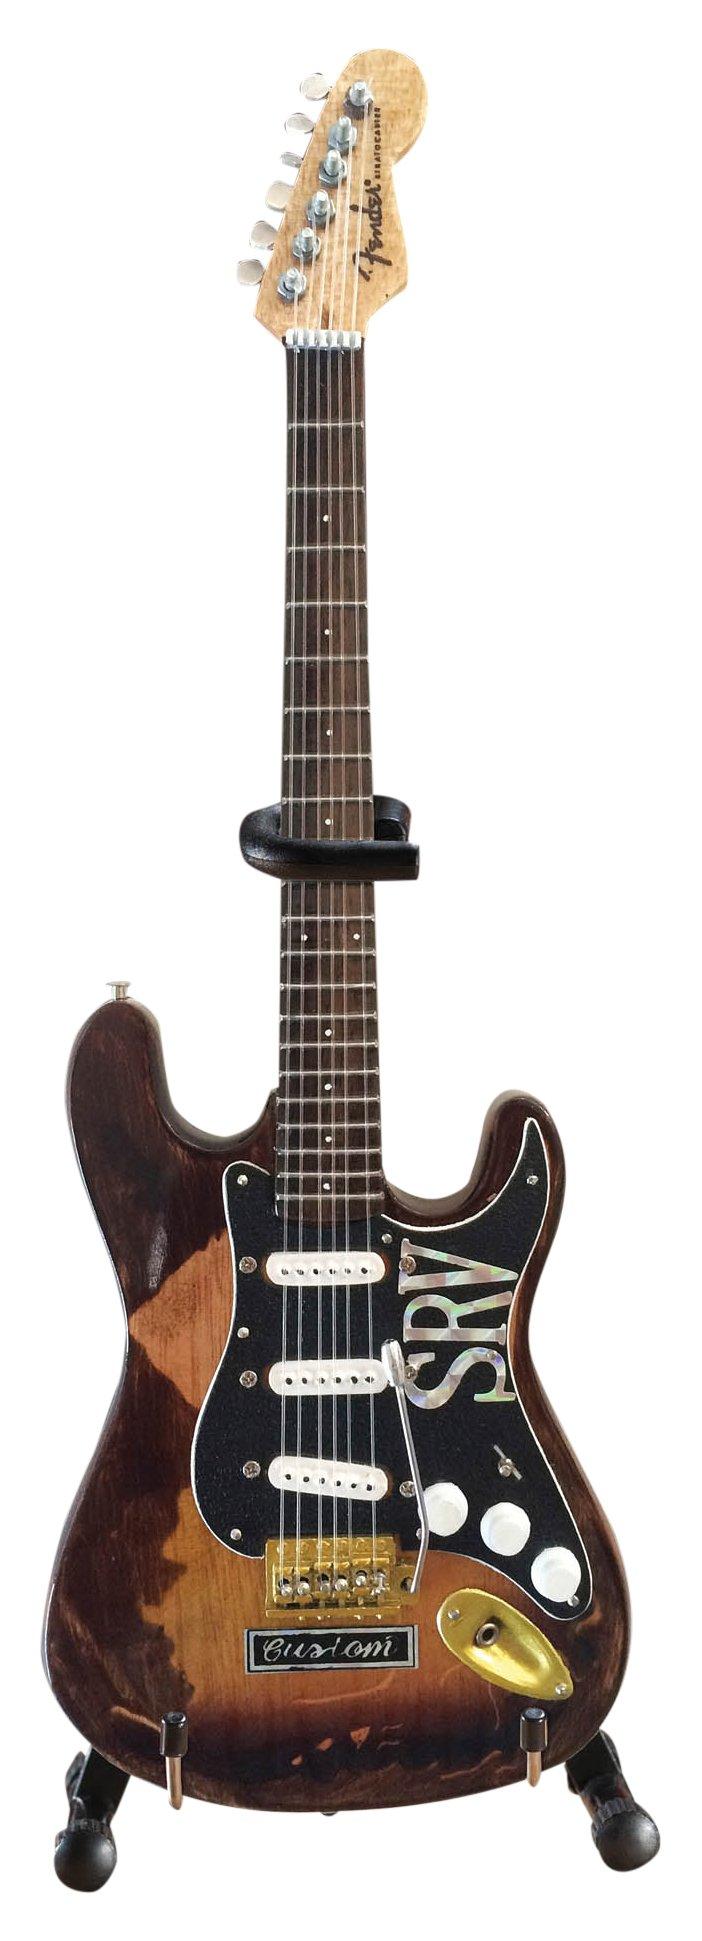 Axe Heaven SRV-040 Model Custom Mini Guitar Replica